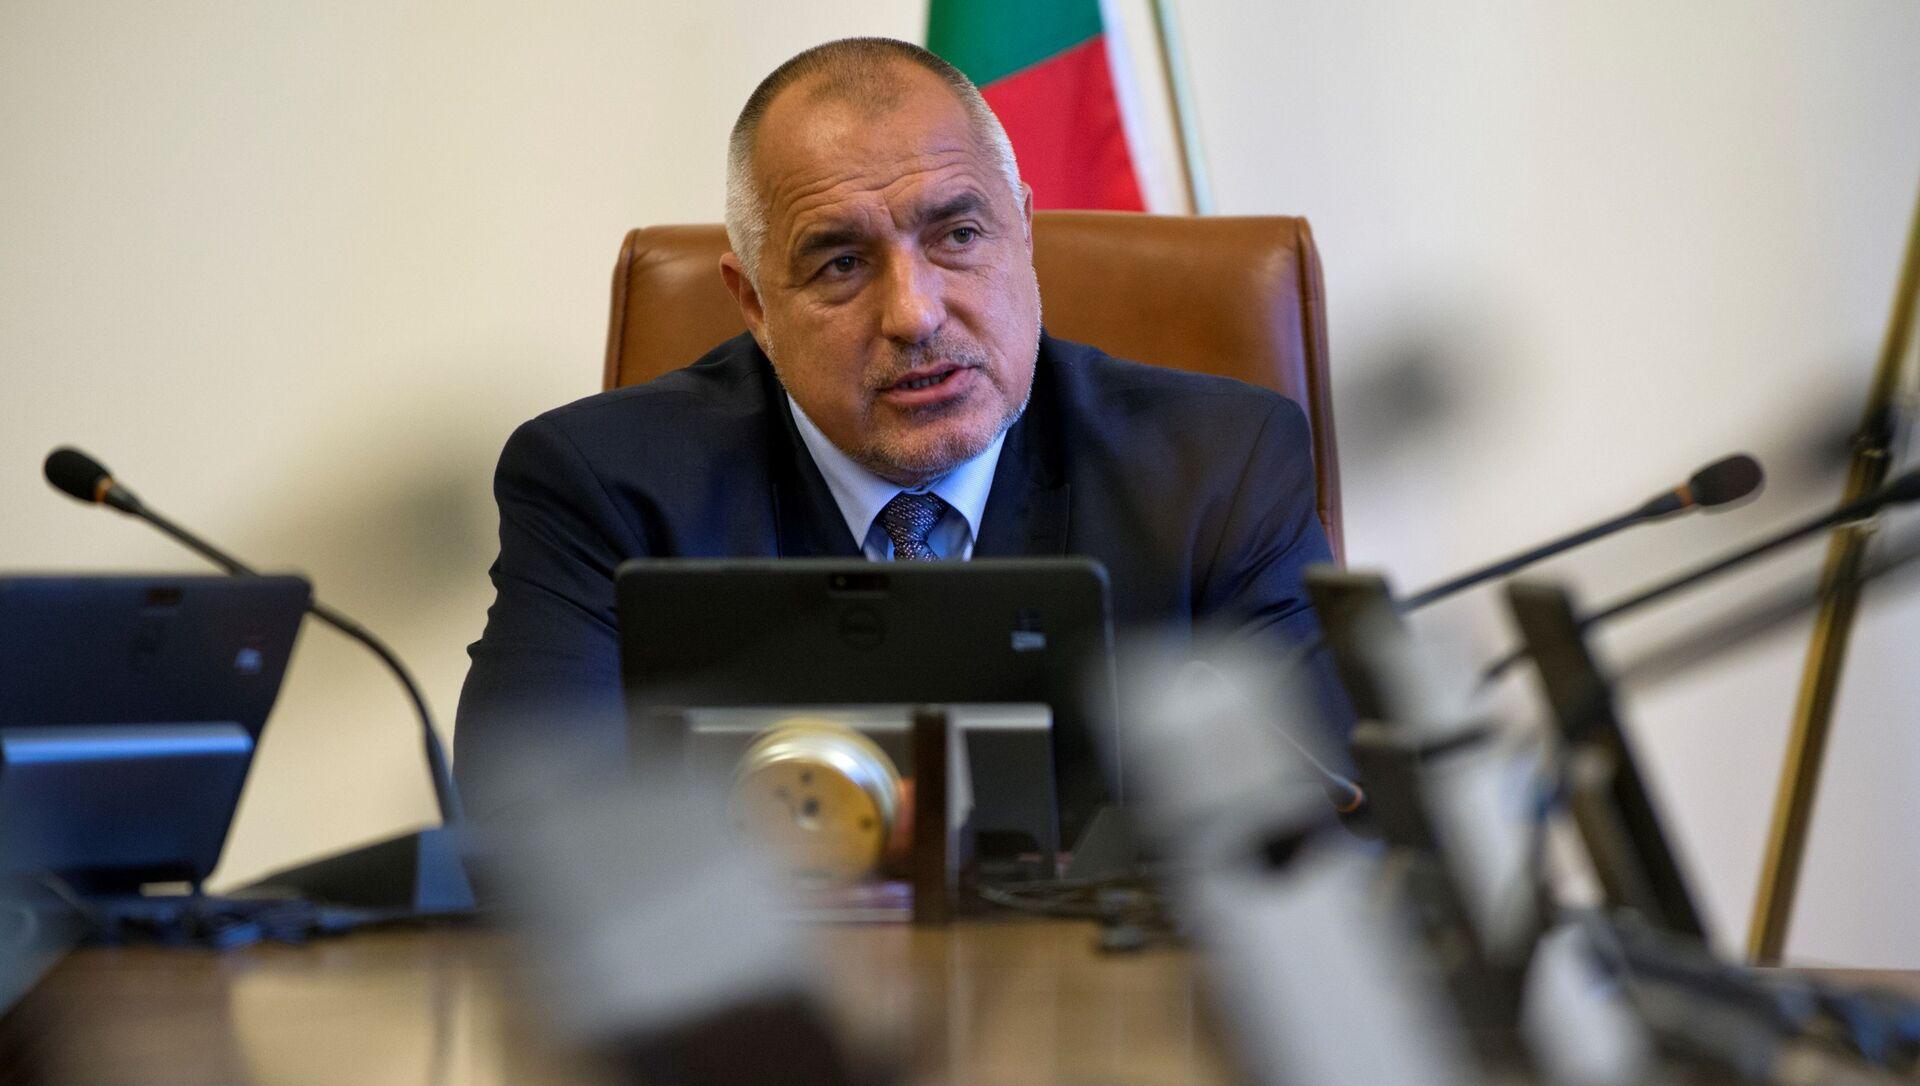 Il primo ministro bulgaro Bojko Borisov - Sputnik Italia, 1920, 16.03.2021